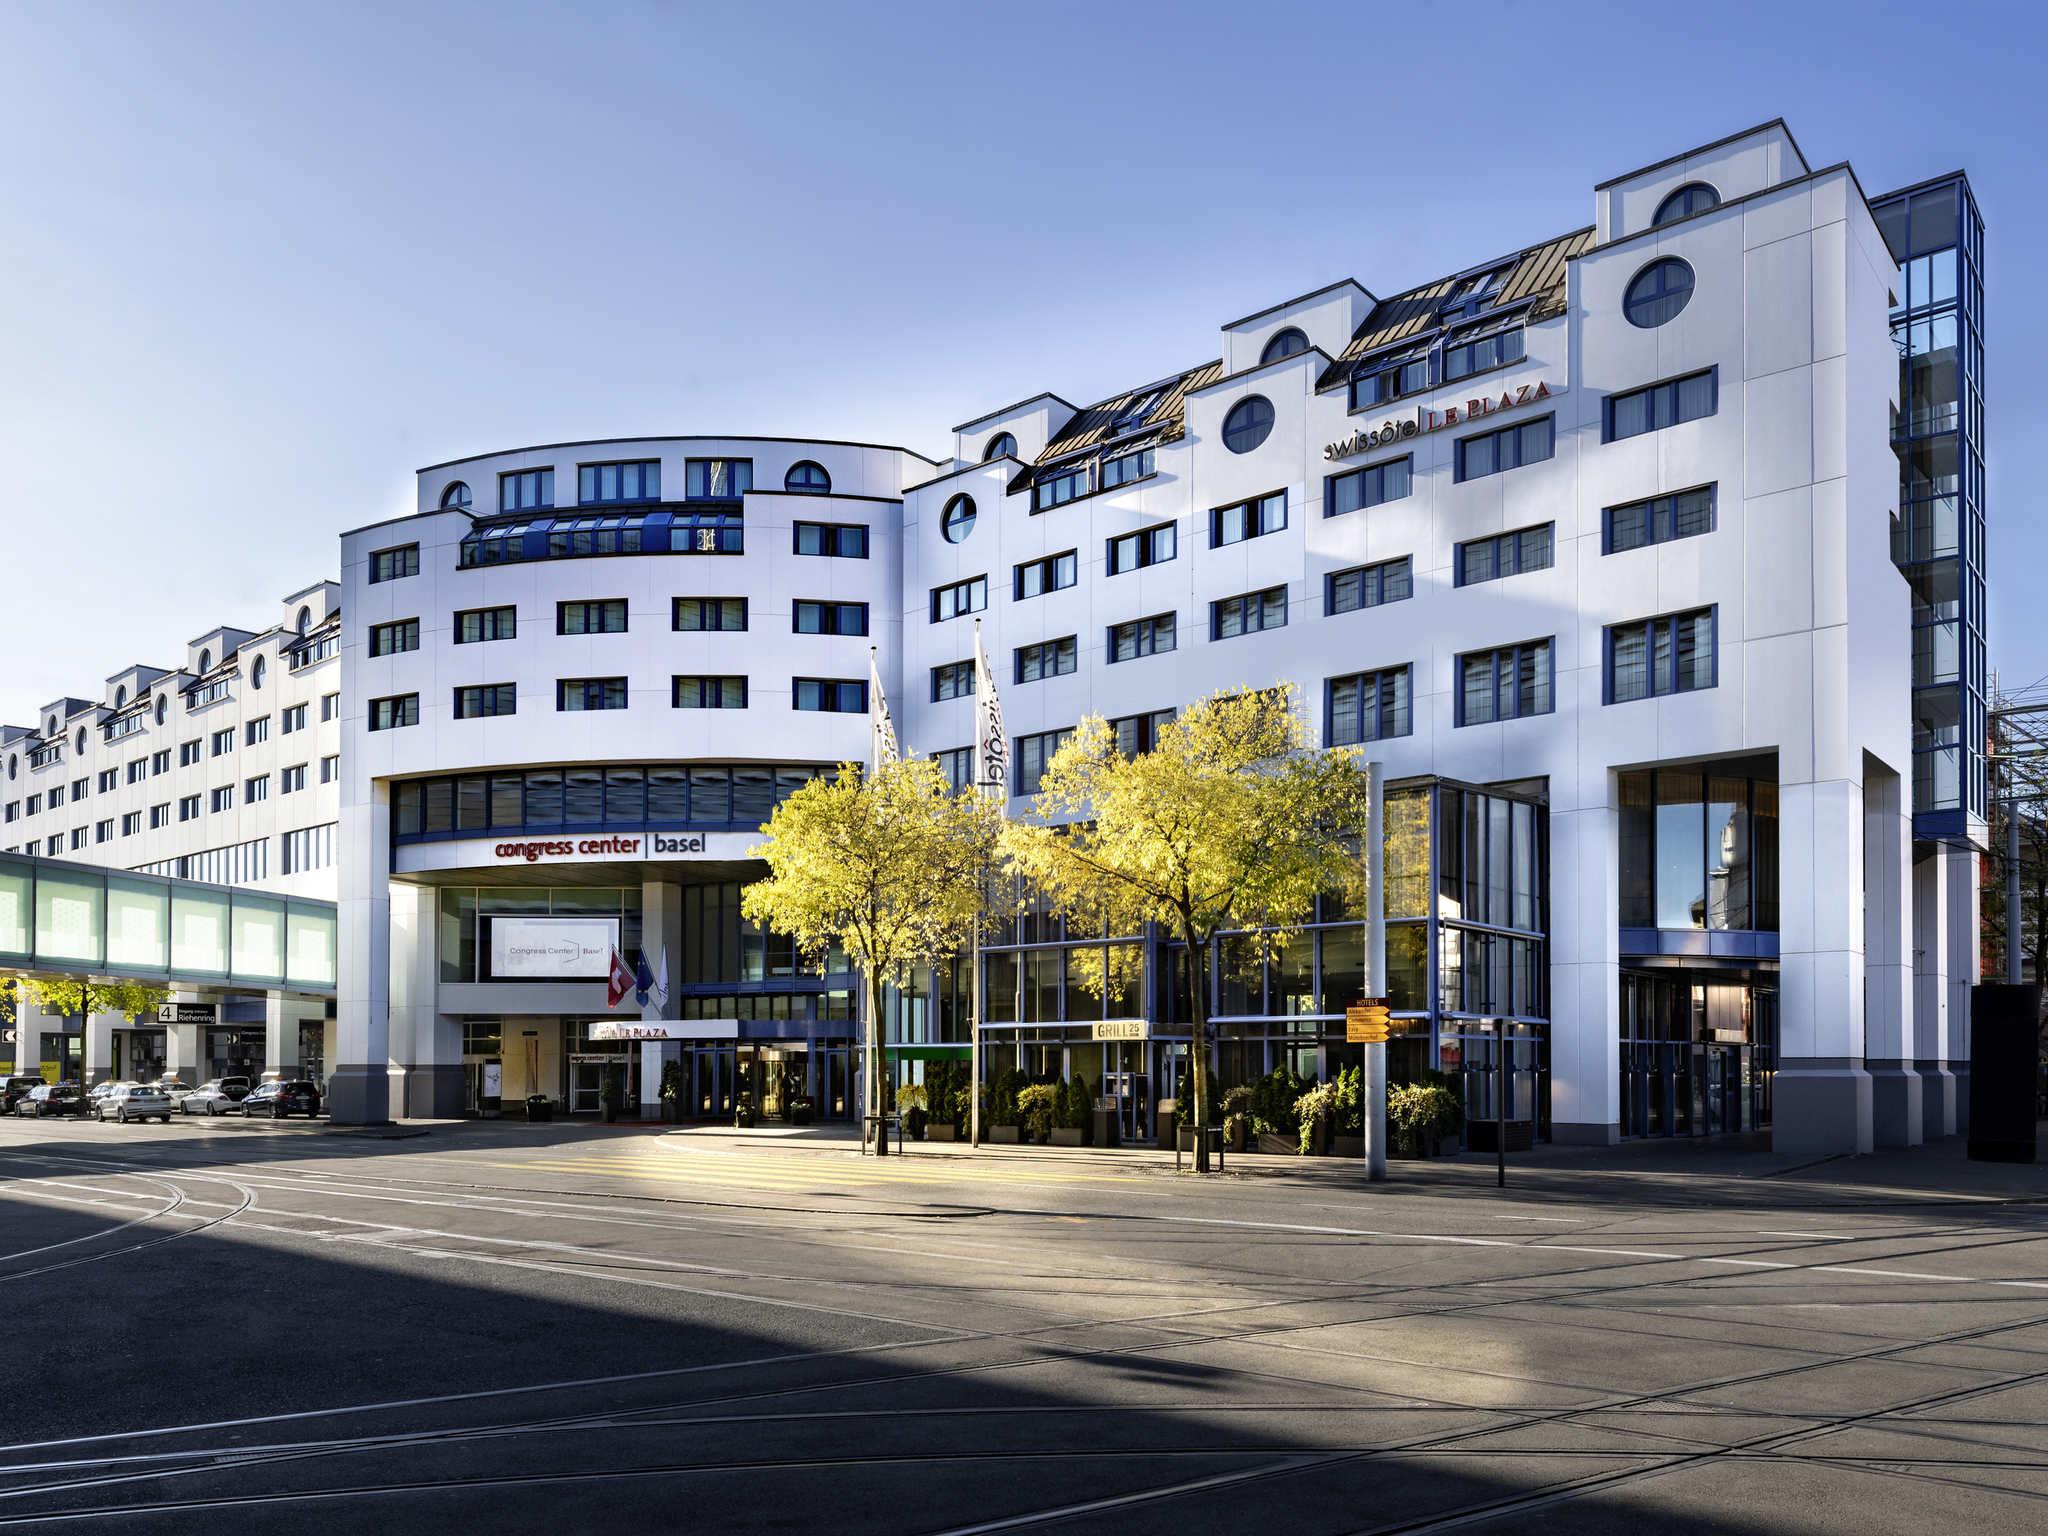 Hotel – Swissôtel Le Plaza Basel